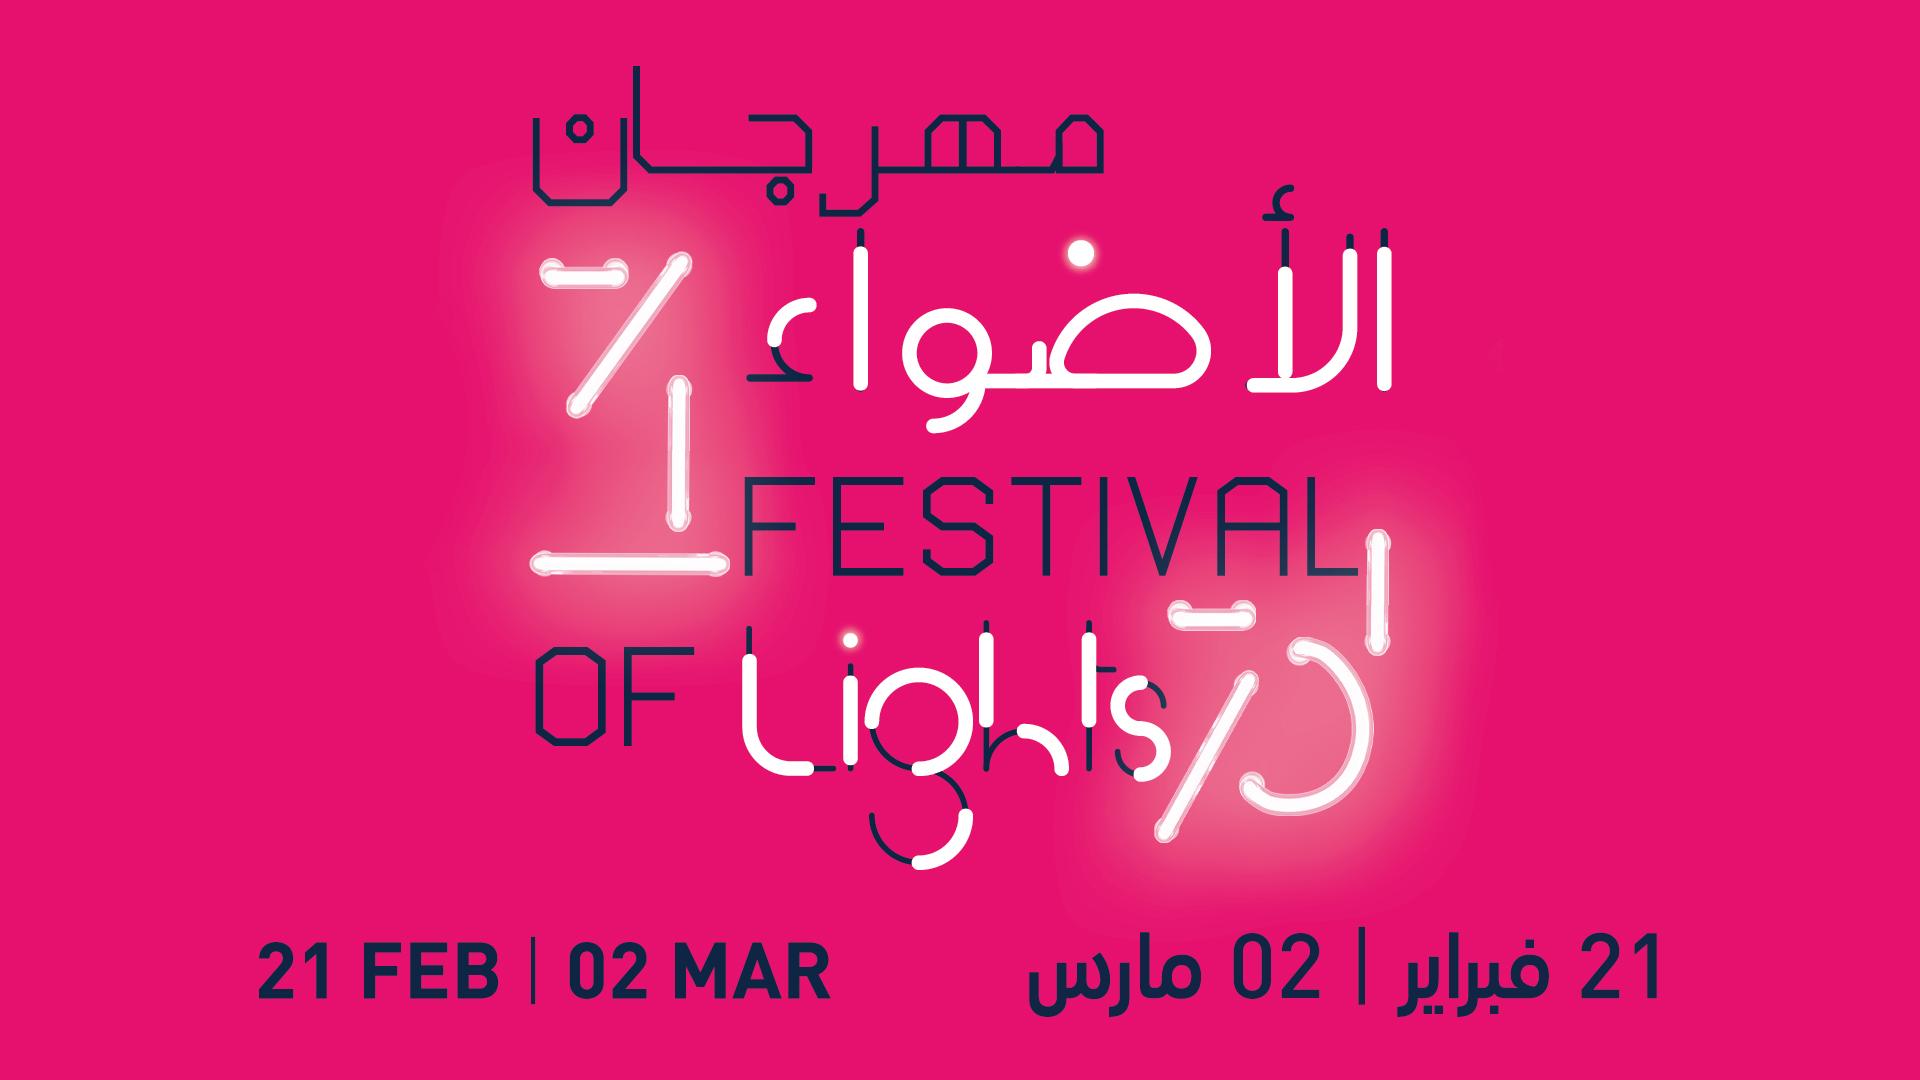 Kuwait Festival of Lights